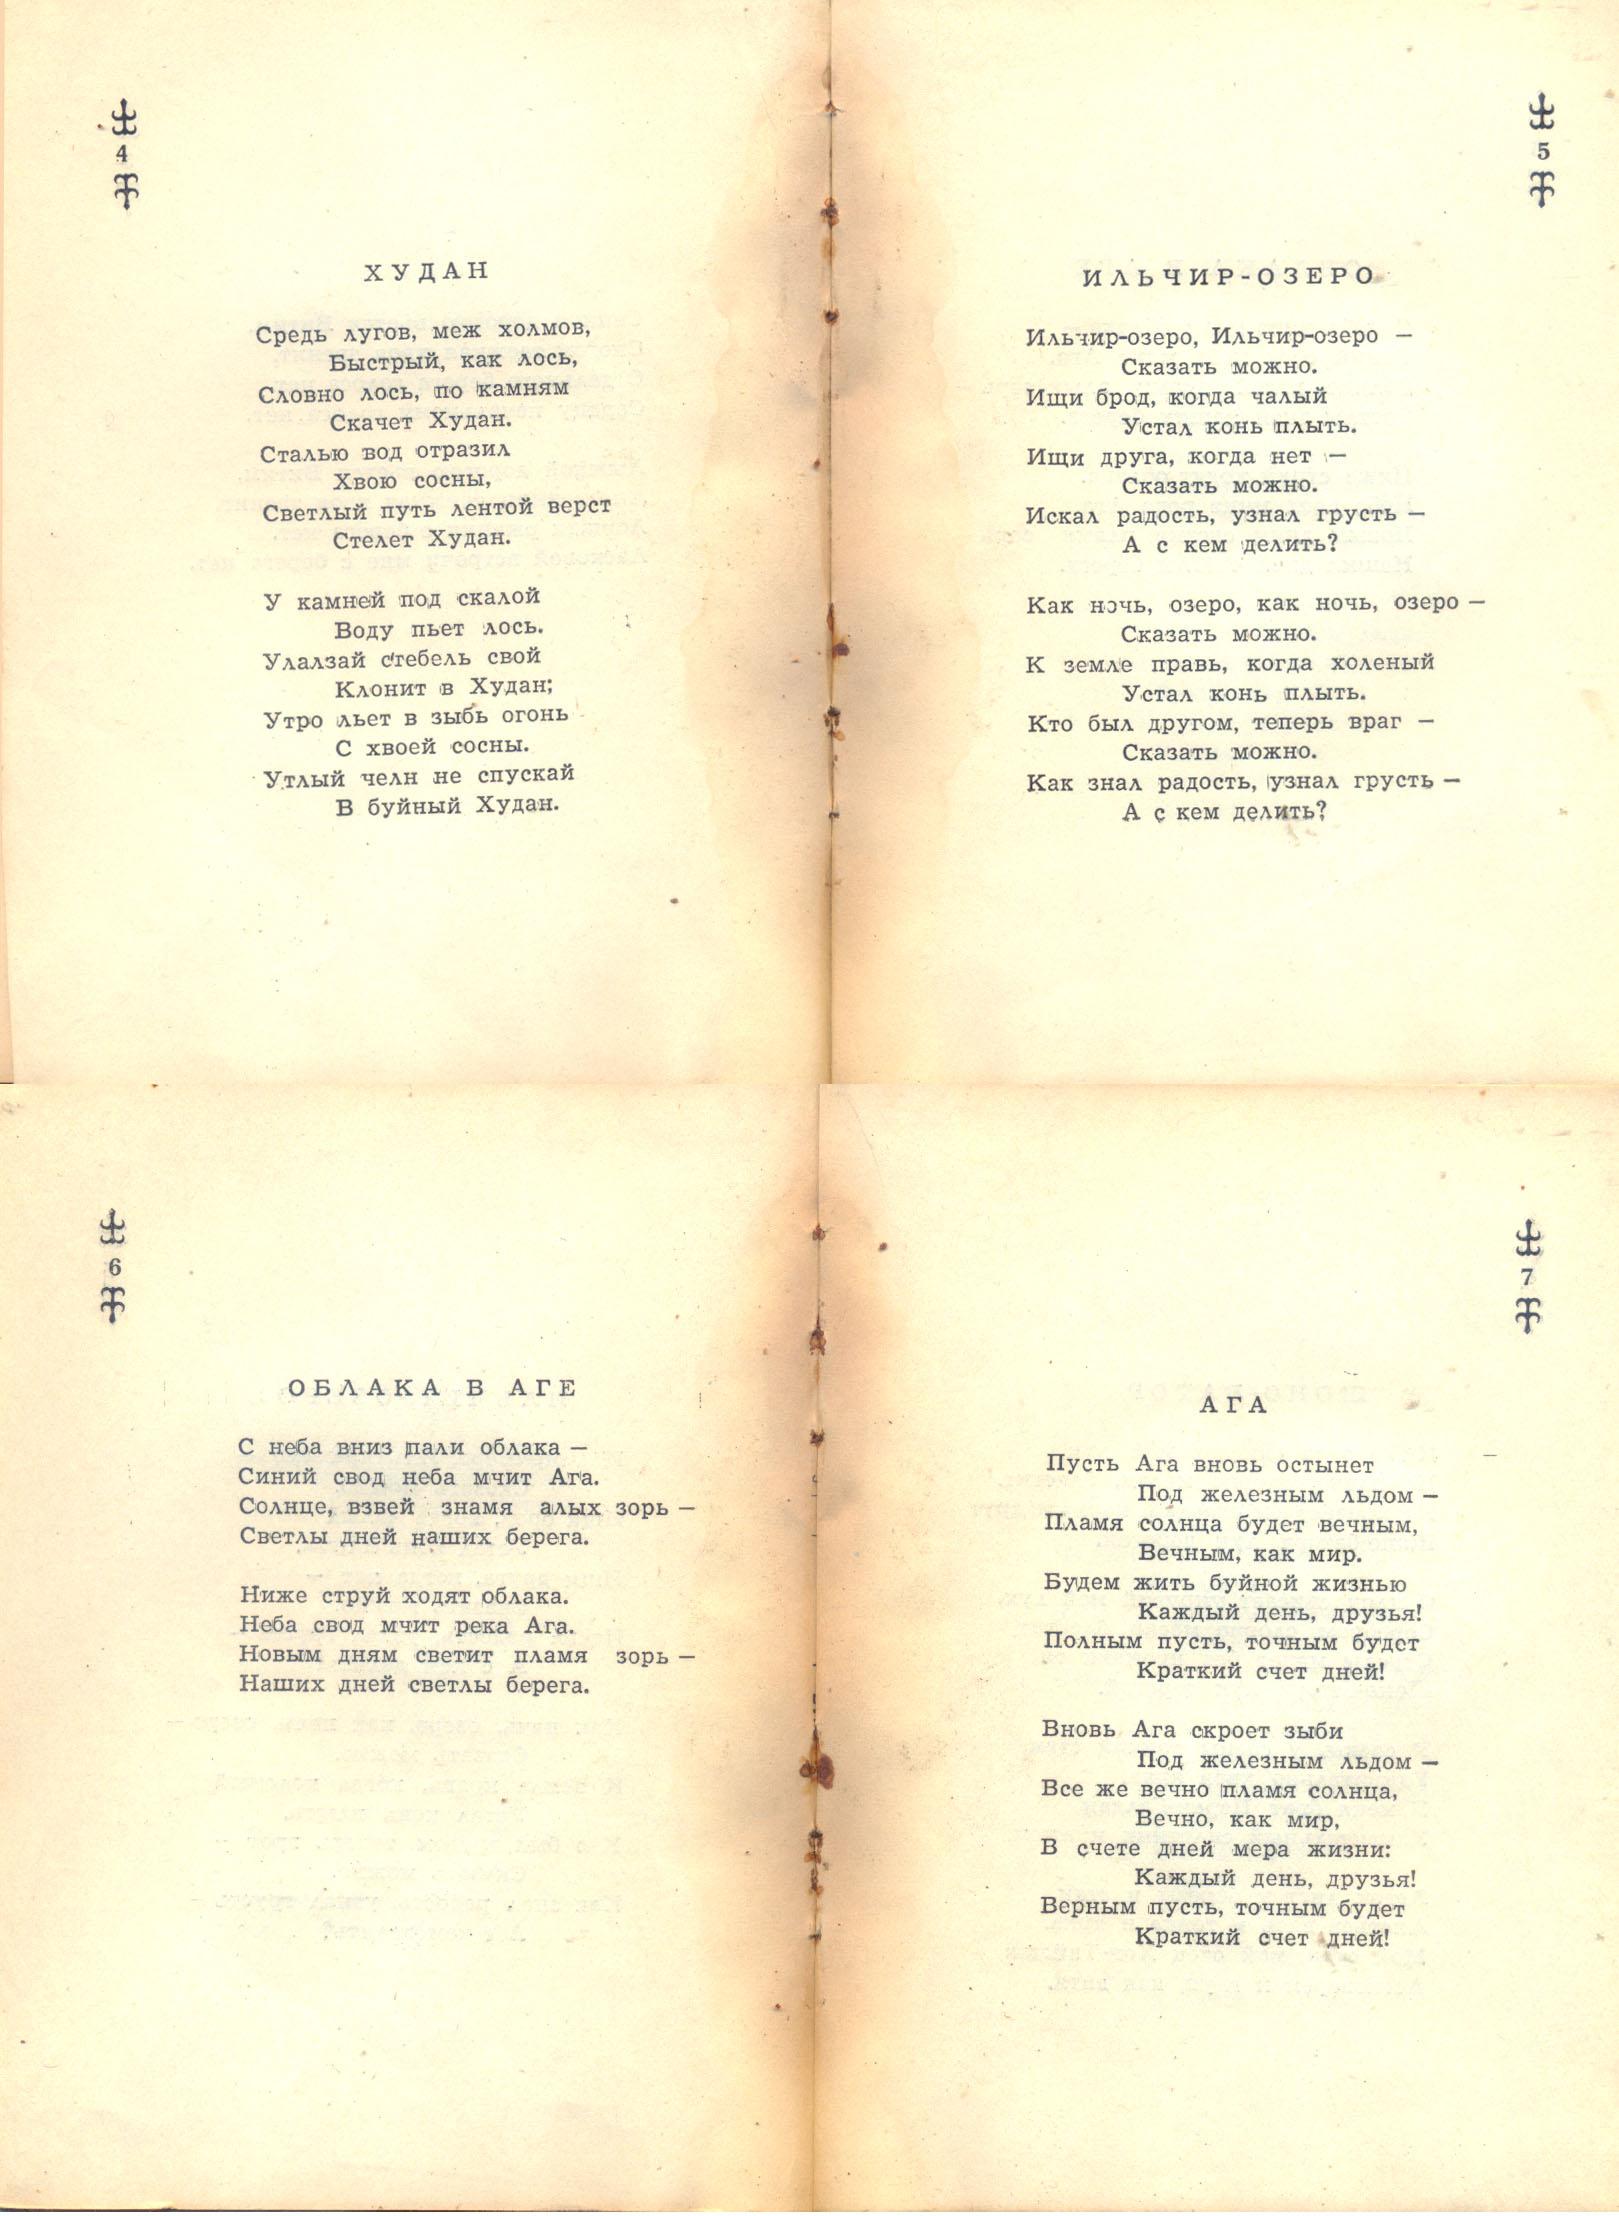 Песни 4-7.jpg